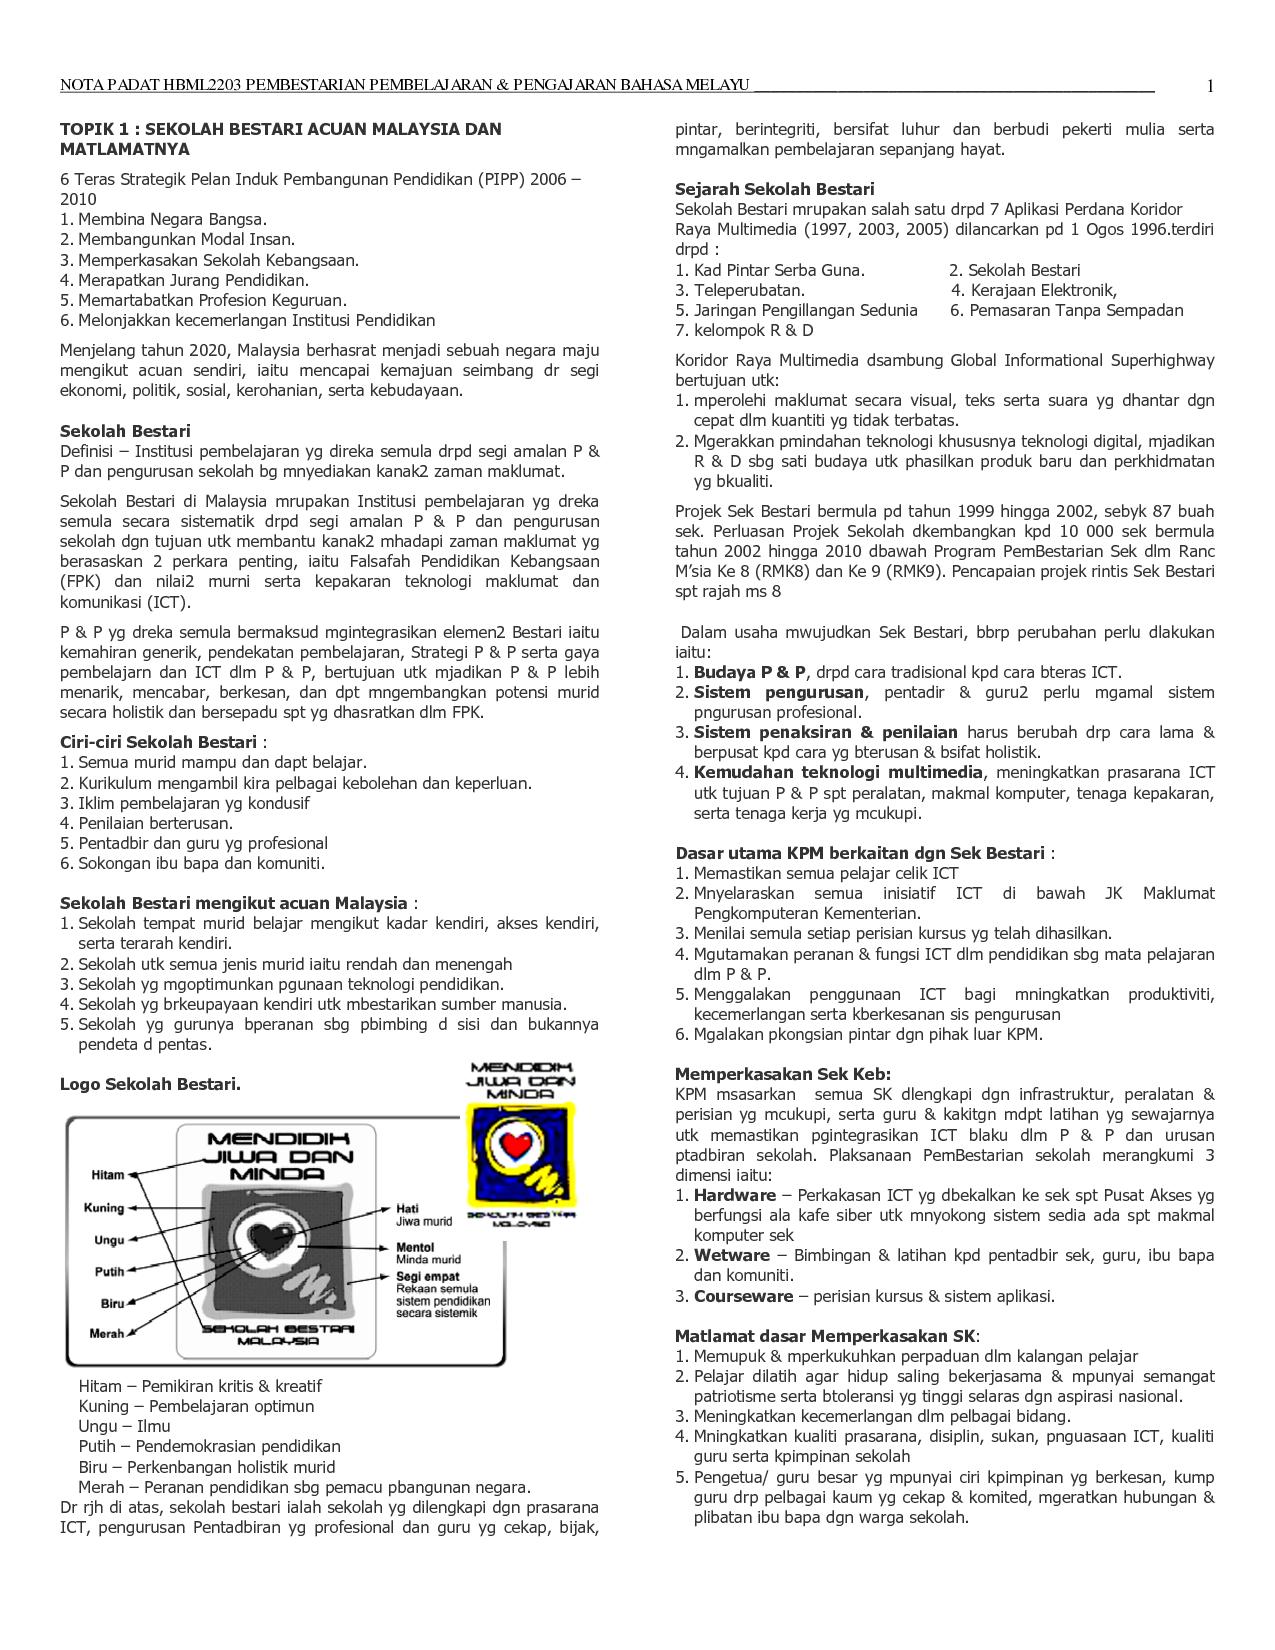 Nota Padat Hbml2203 Bullet Journal Journal